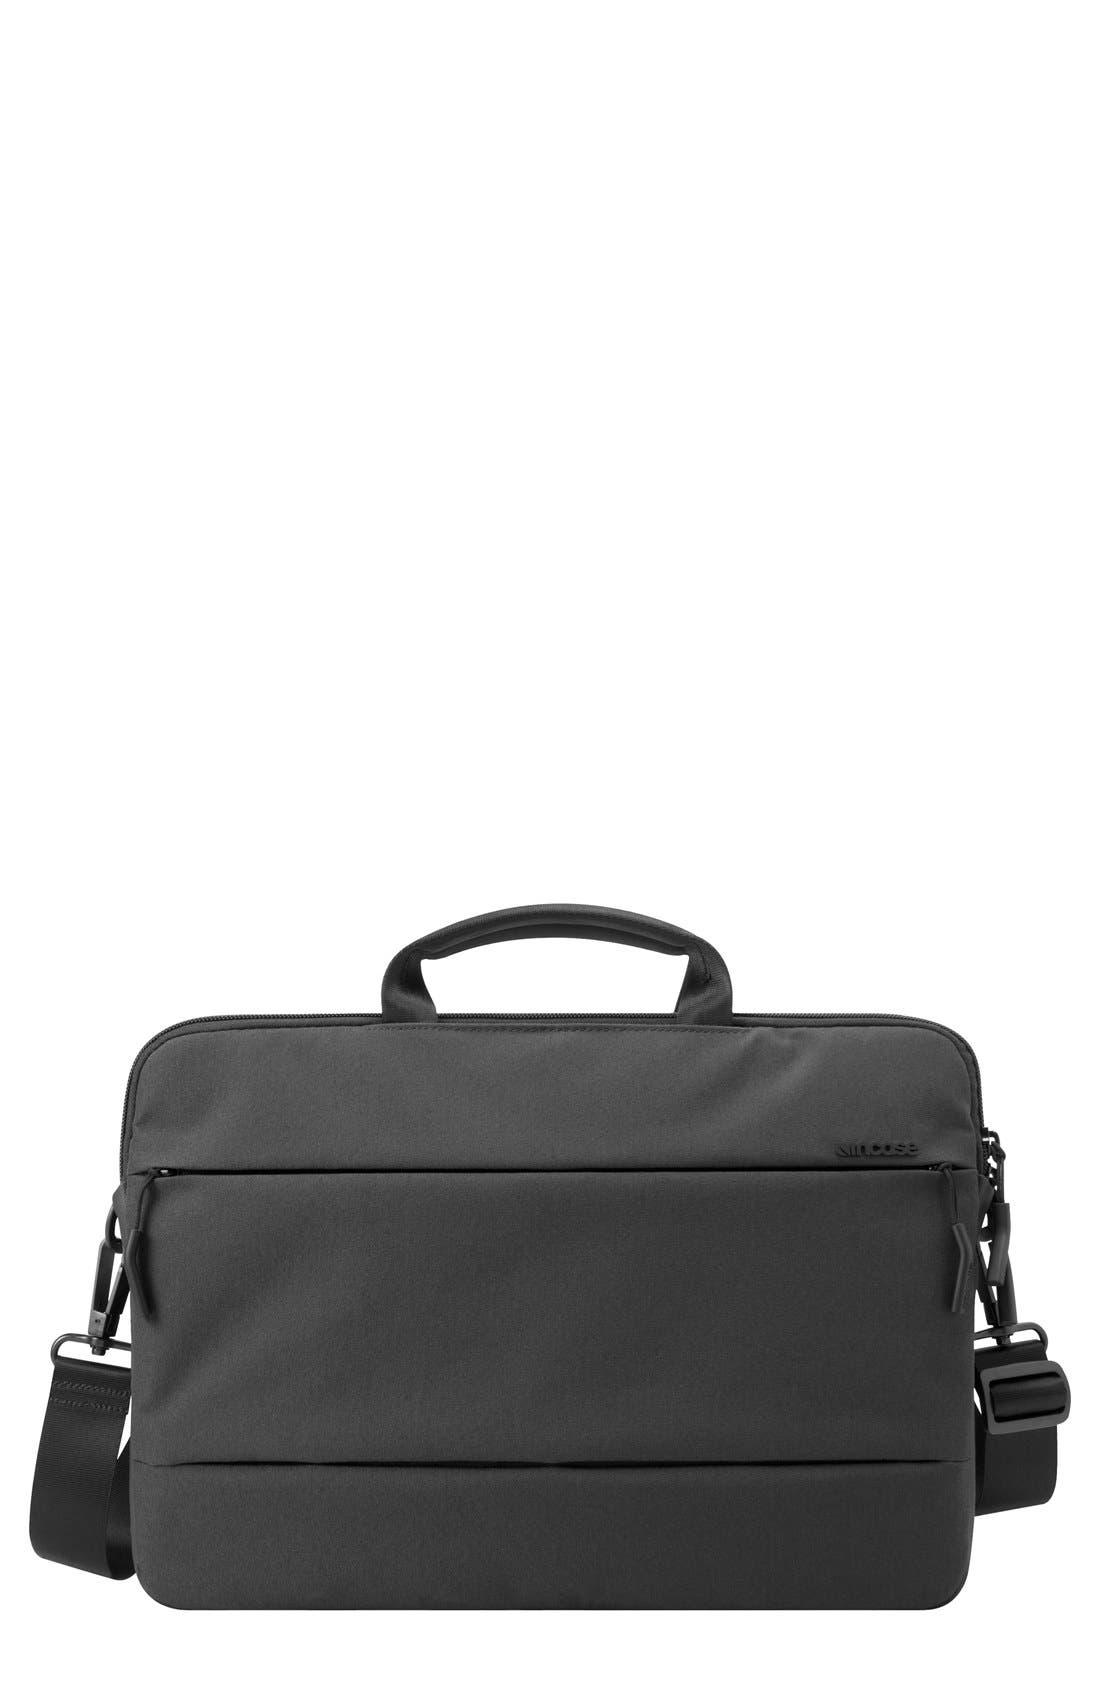 City Collection 15-Inch Briefcase,                         Main,                         color, BLACK